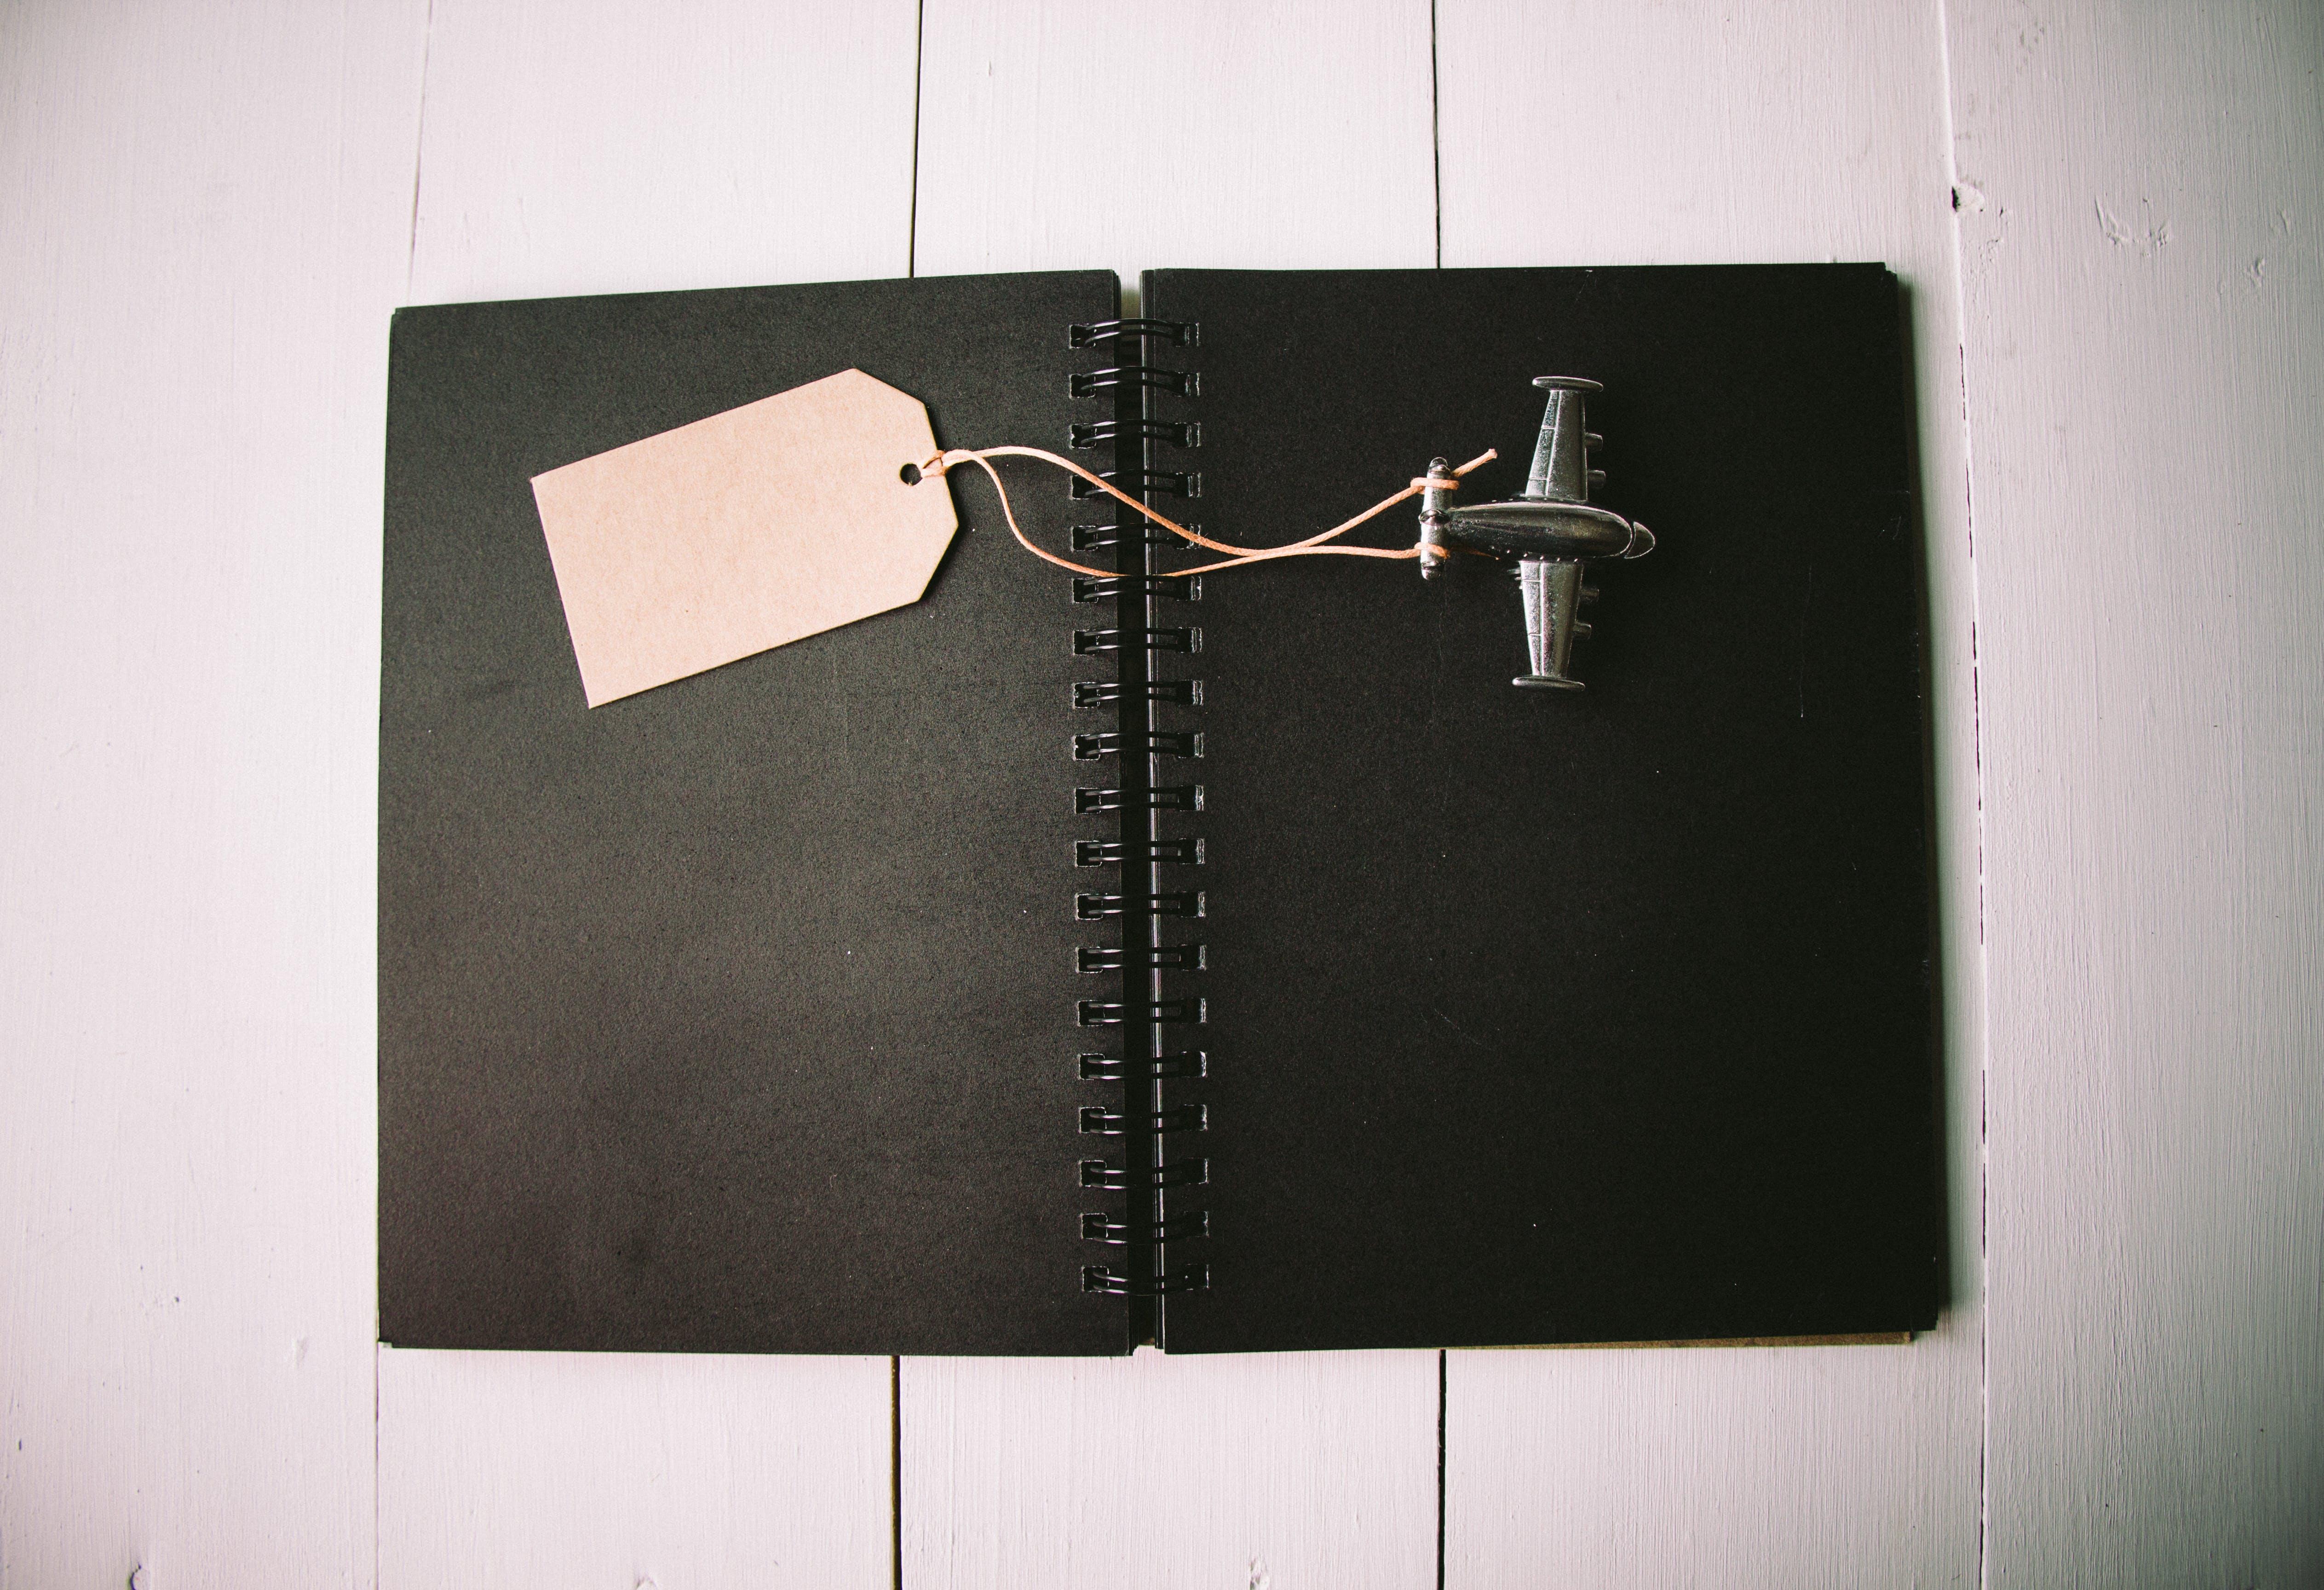 Brown Bookmark and Black Plane Keychain